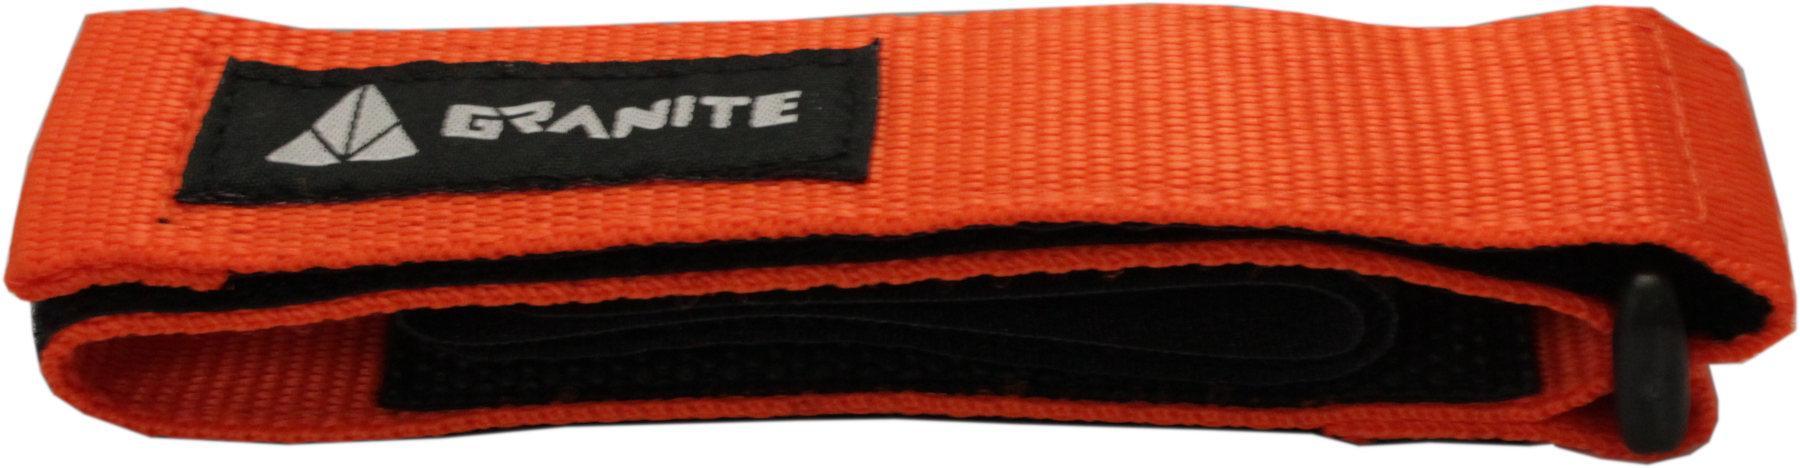 Orange Granite Design Rockband Carrier Strap